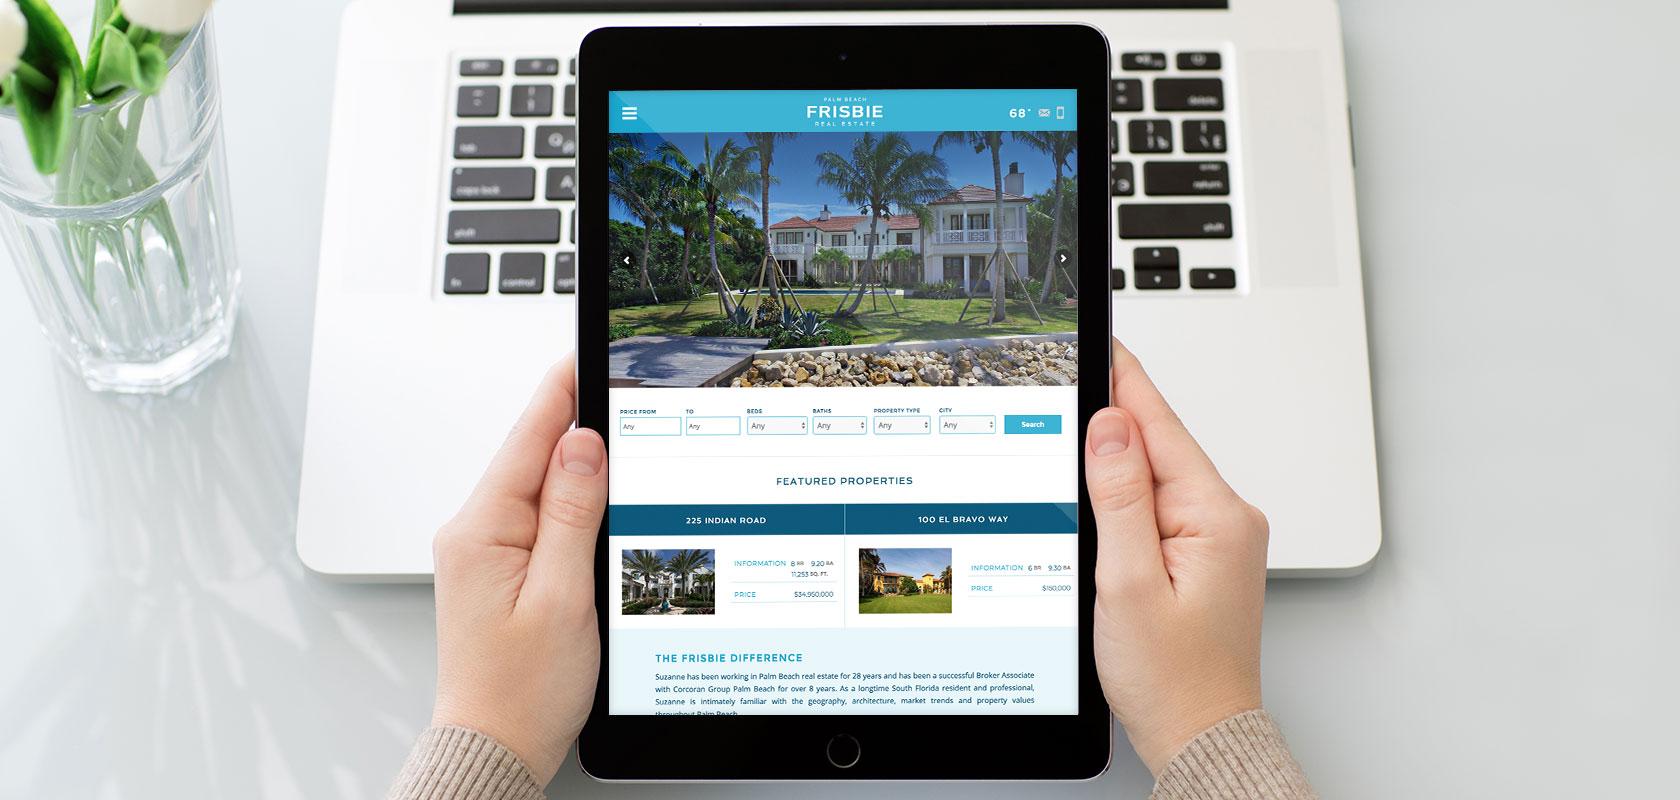 Frisbie Palm Beach tablet